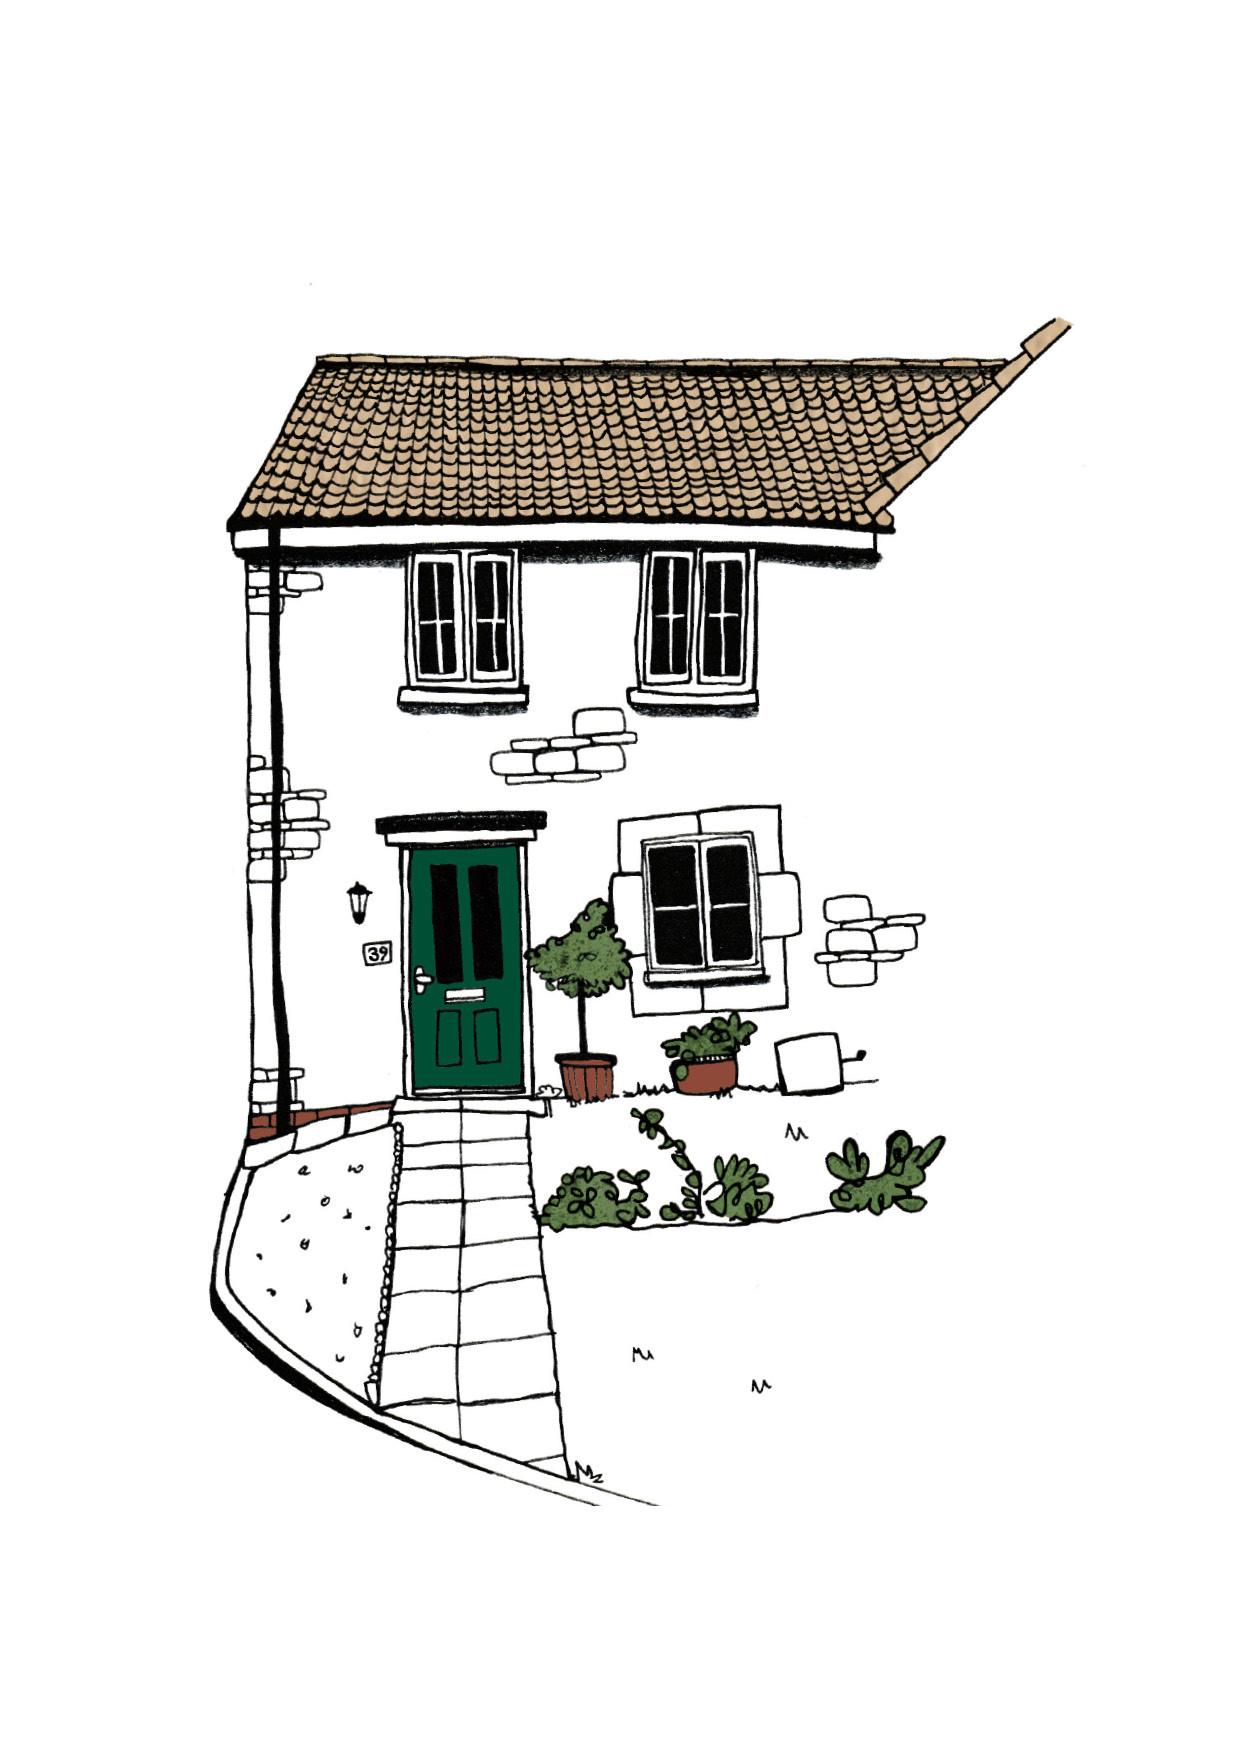 House jpegs for web6.jpg